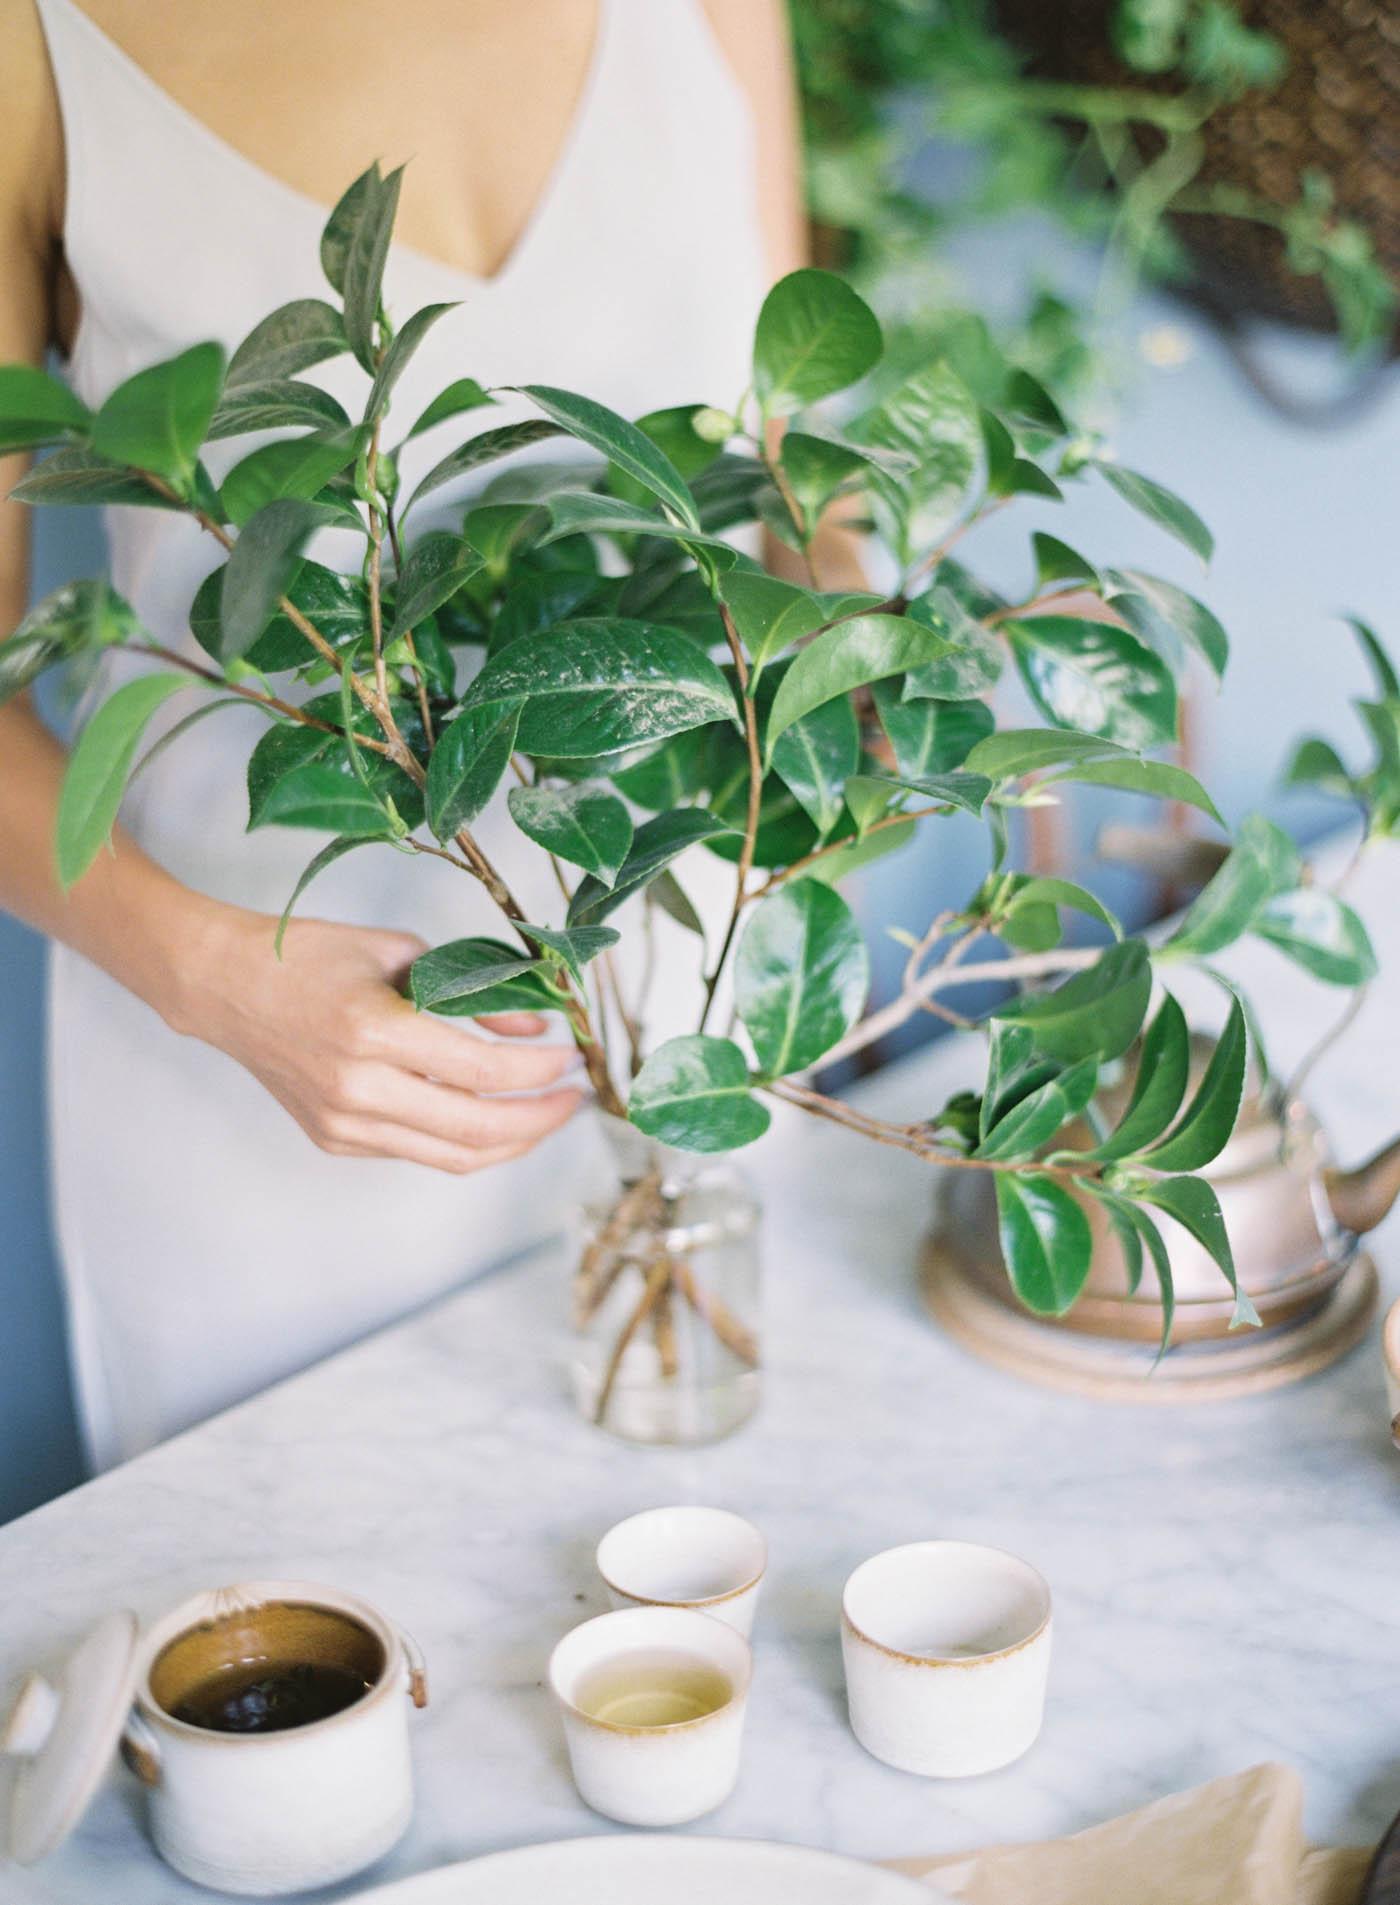 riviera-house-engagement-105-Jen_Huang-Tea-Ceremony-345-Jen_Huang-004149-R1-007.jpg